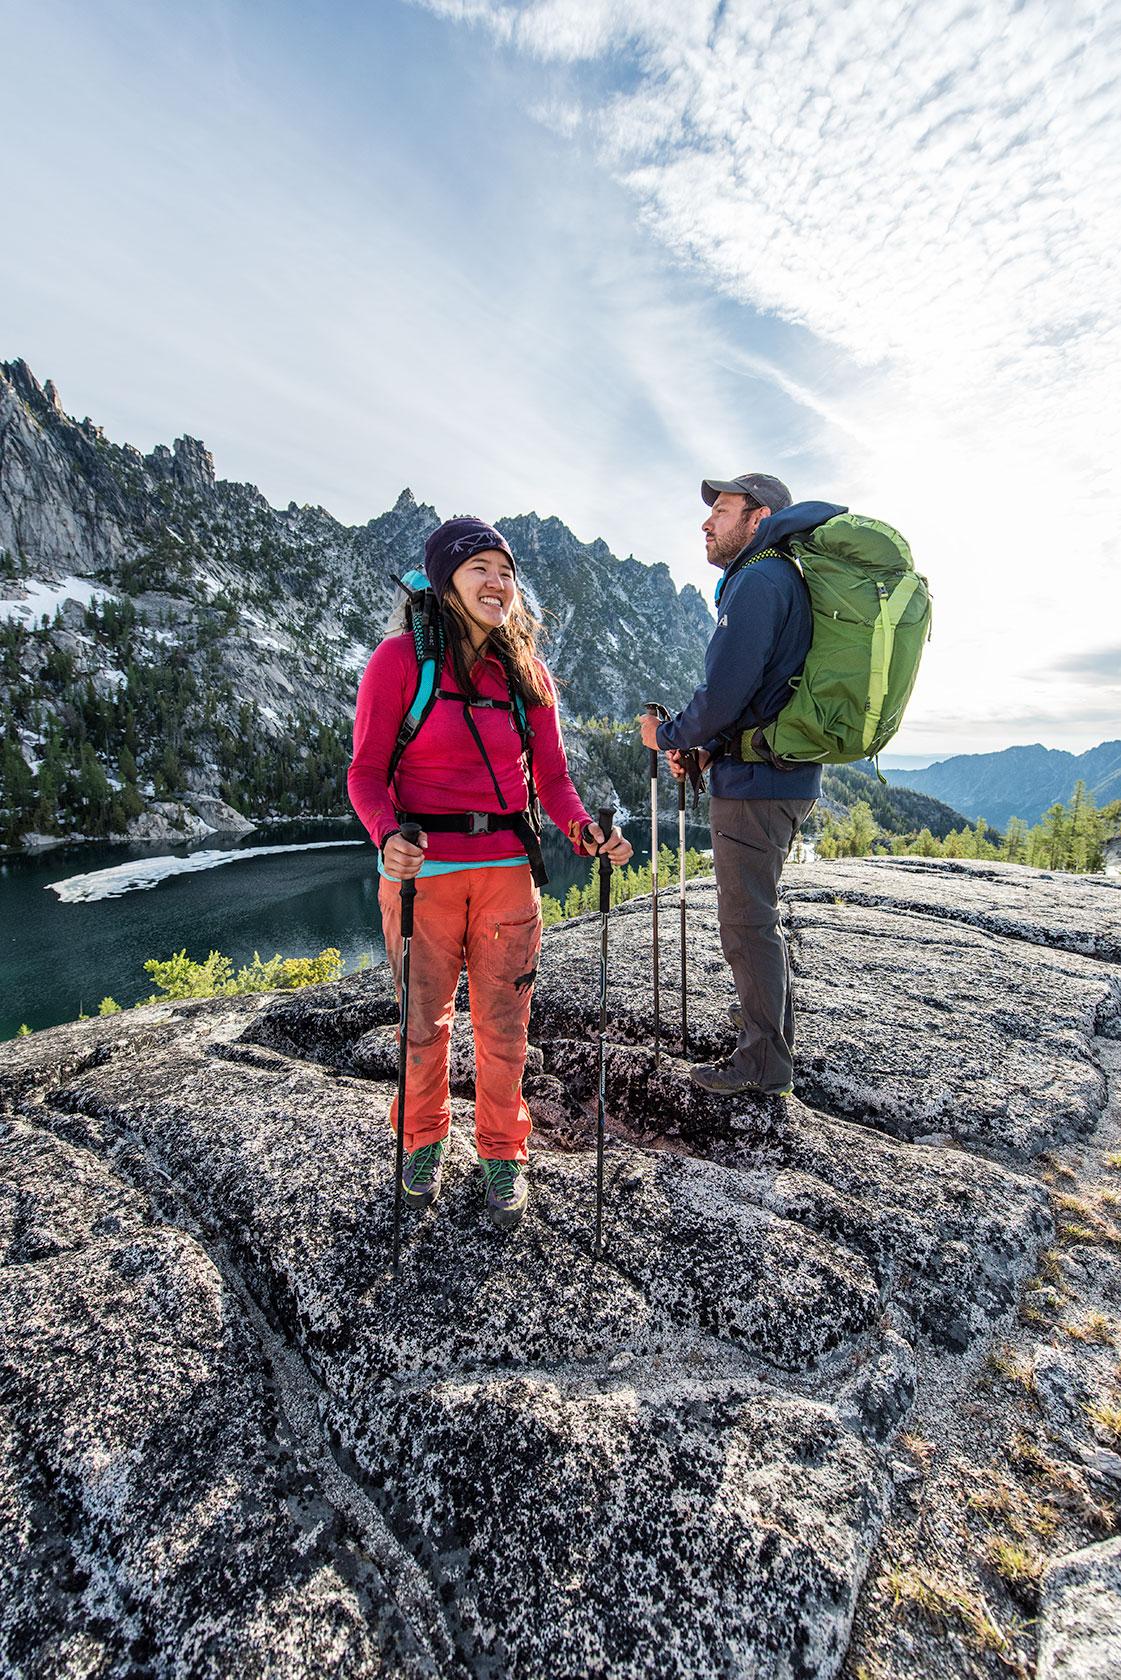 austin-trigg-osprey-hiking-backpacks-hike-camp-washington-adventure-morning-sunrise-lifestyle-outdoor-enchantments-alpine-lake-wilderness-laugh.jpg